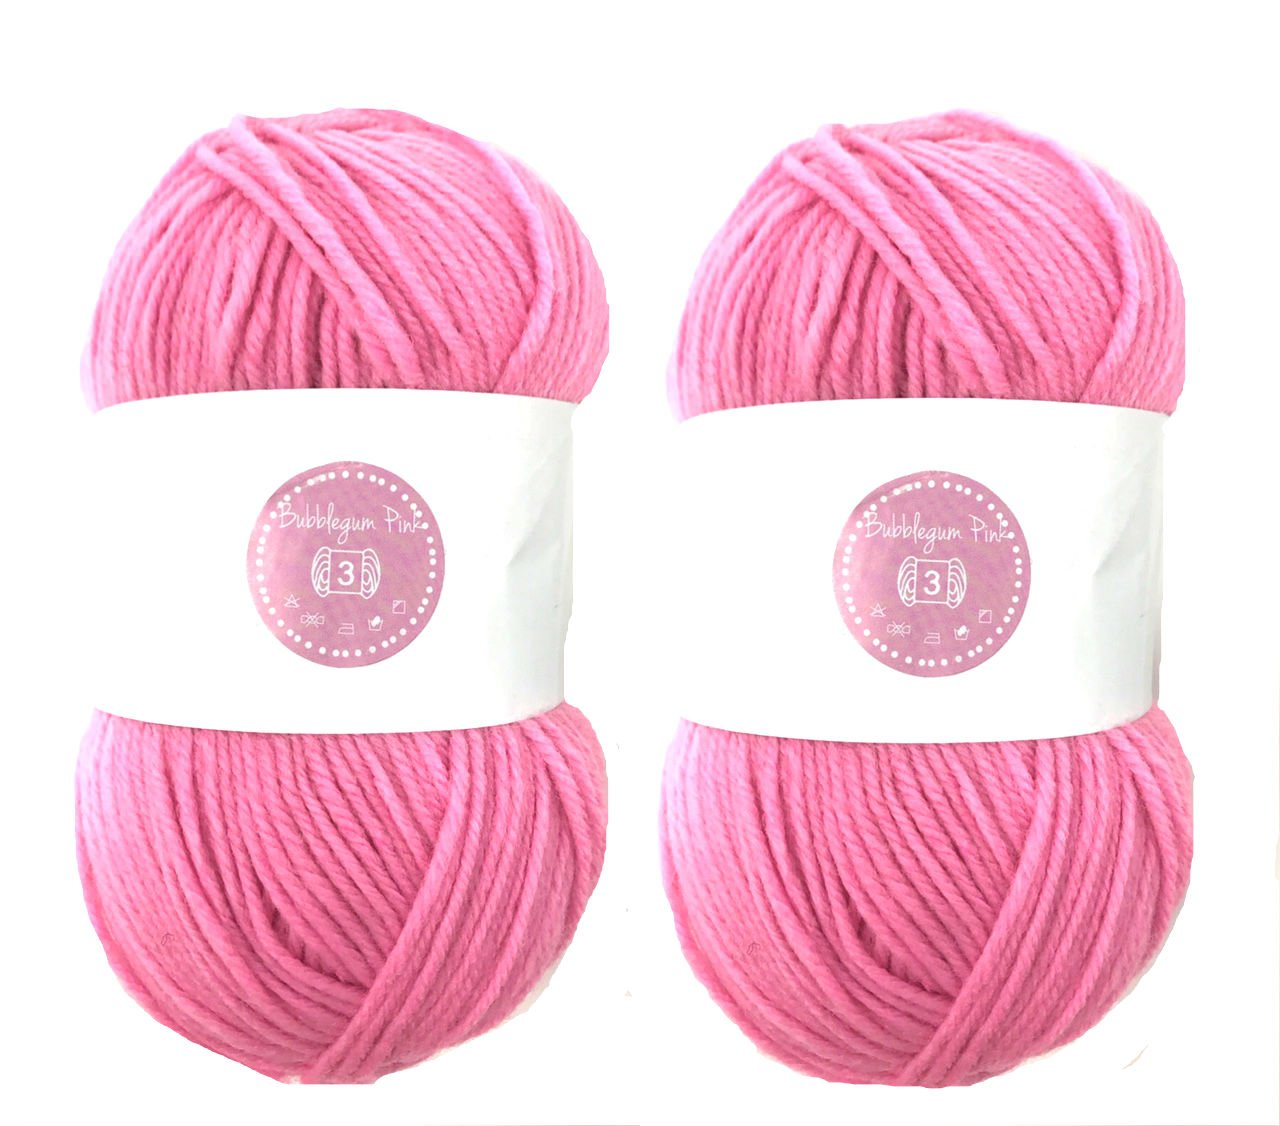 Bubblegum Pink House of Cecilia 2 x 100g balls 100% acrylic knitting yarn crochet crafts